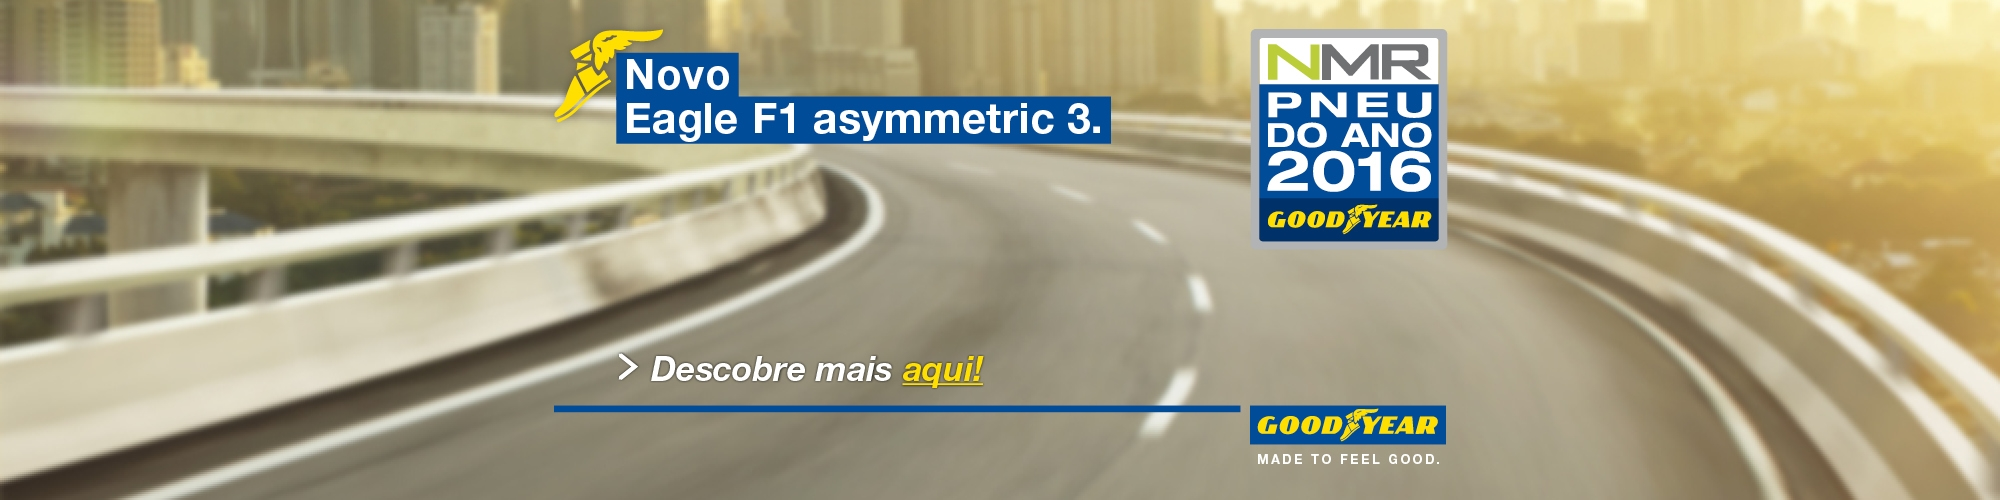 NEUMATICO DEL AÑO - F1 asymmetric 3